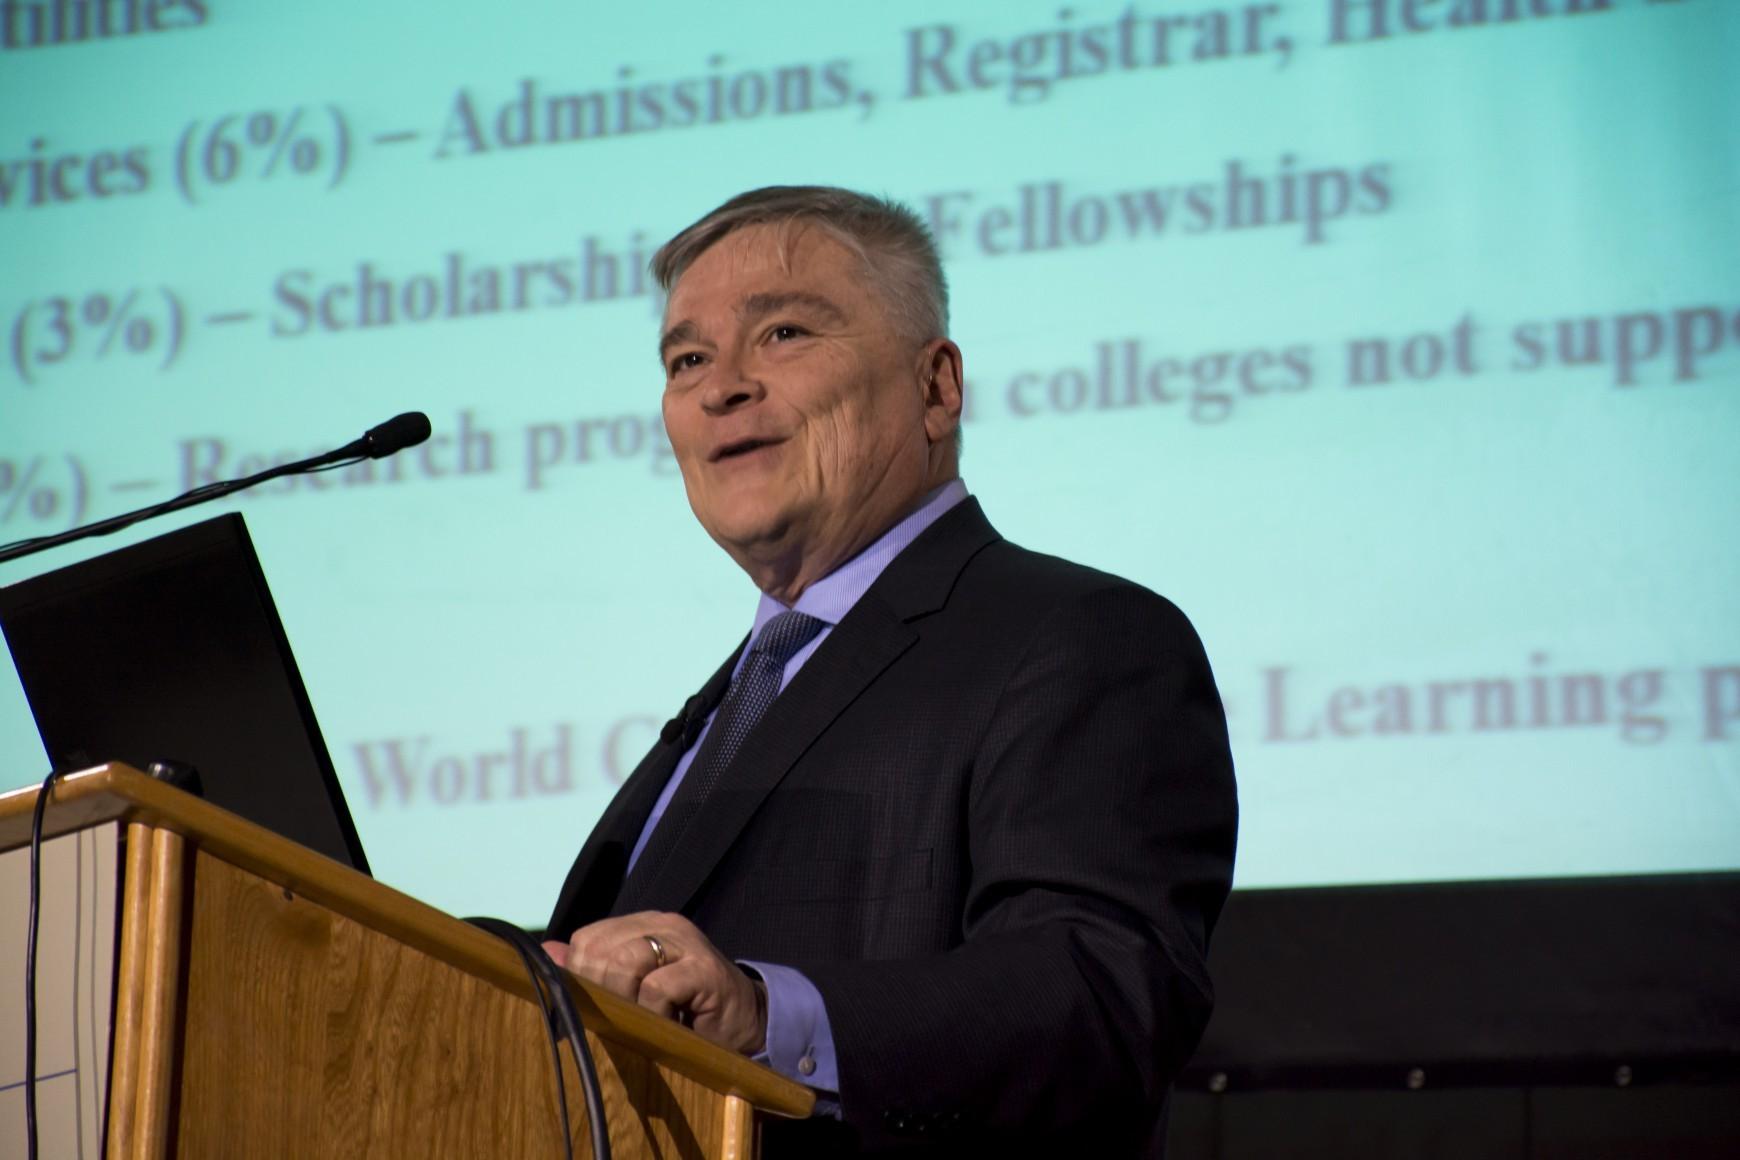 Alumni Trustees Ask For Legal Fees, President Barron Has